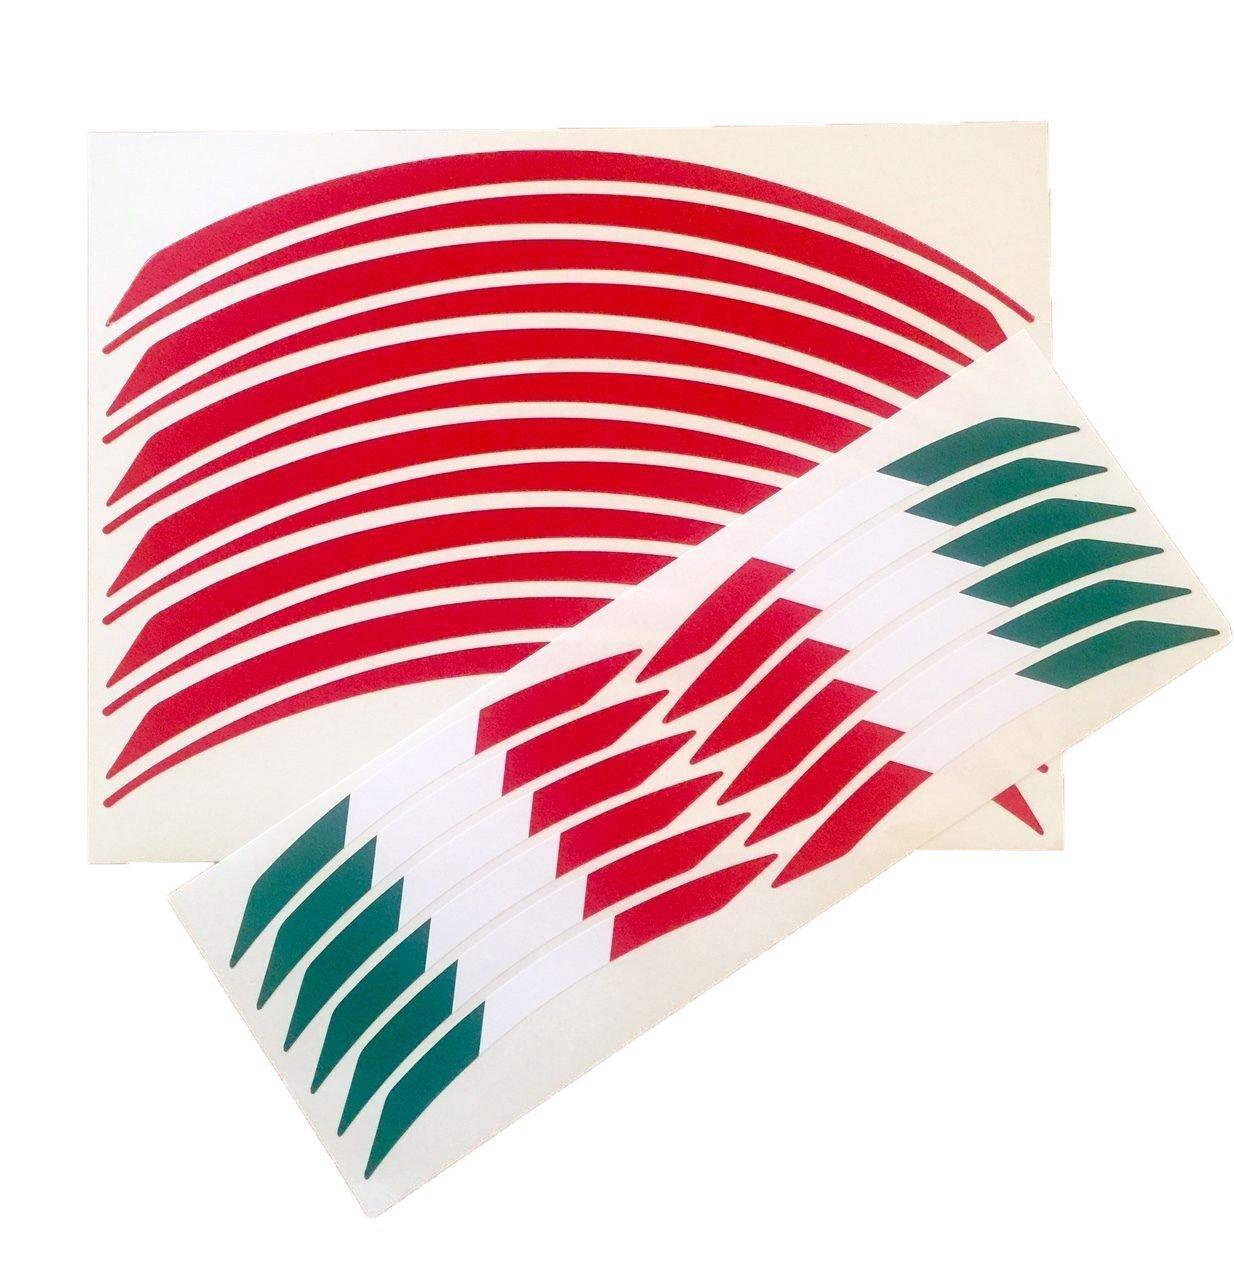 UNIVERSAL DUCATI APRILIA MV AGUSTA BENELLI MOTO GUZZI MOTORCYCLE WHEEL RIM STICKERS TRIM ITALIAN FLAG RED VINYL RACING WHEEL RIM